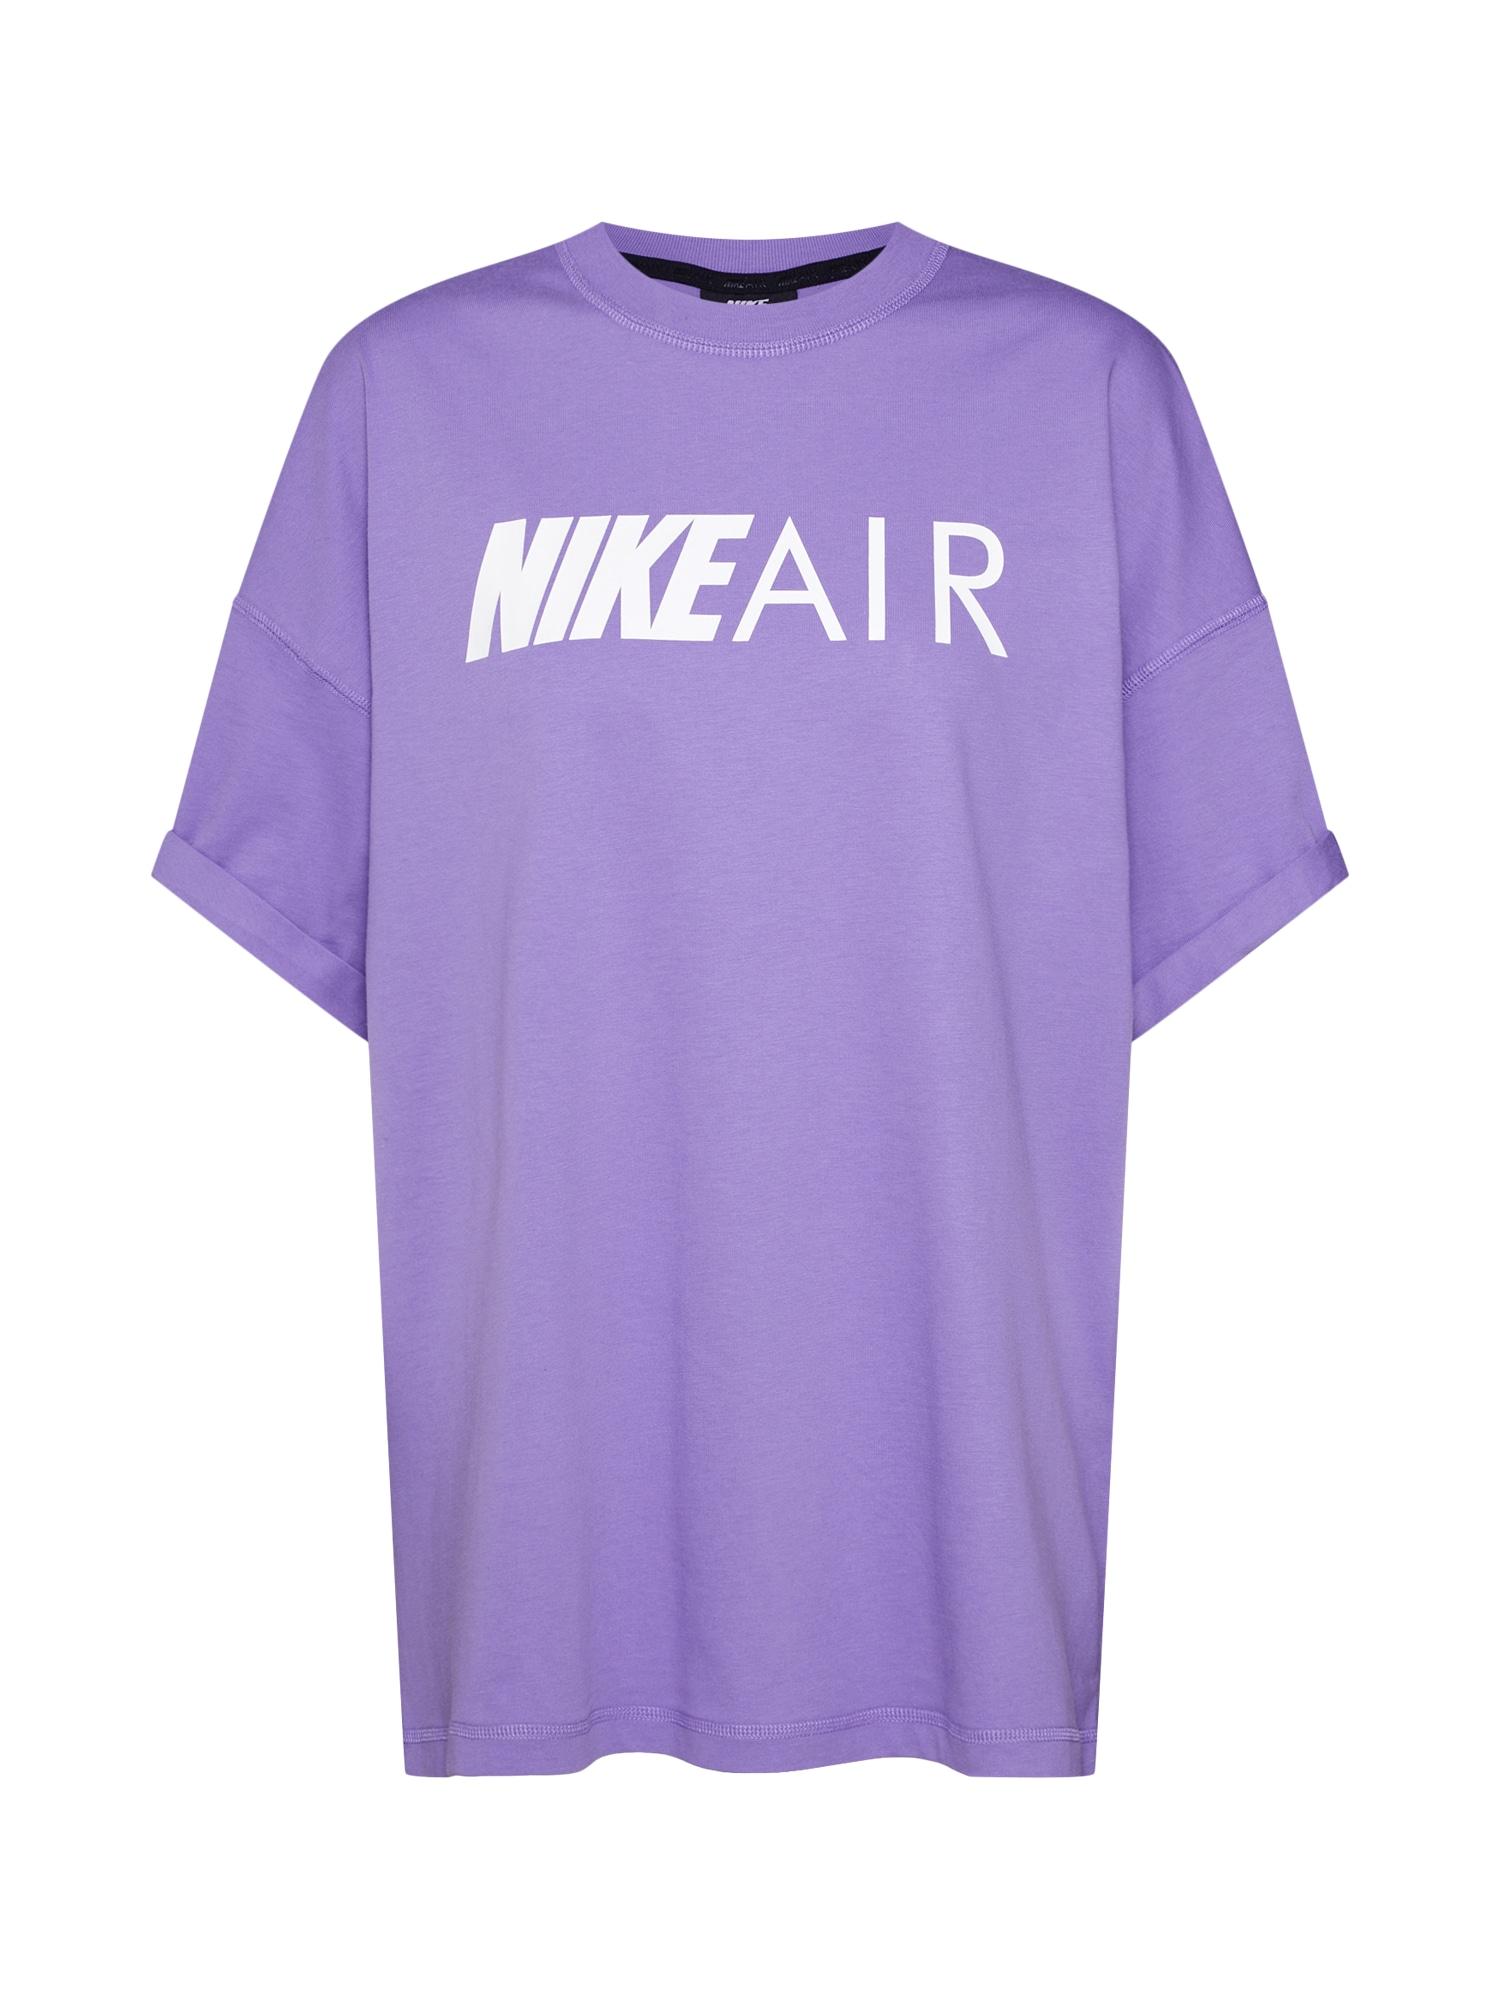 Oversized tričko Air BF fialová bílá Nike Sportswear